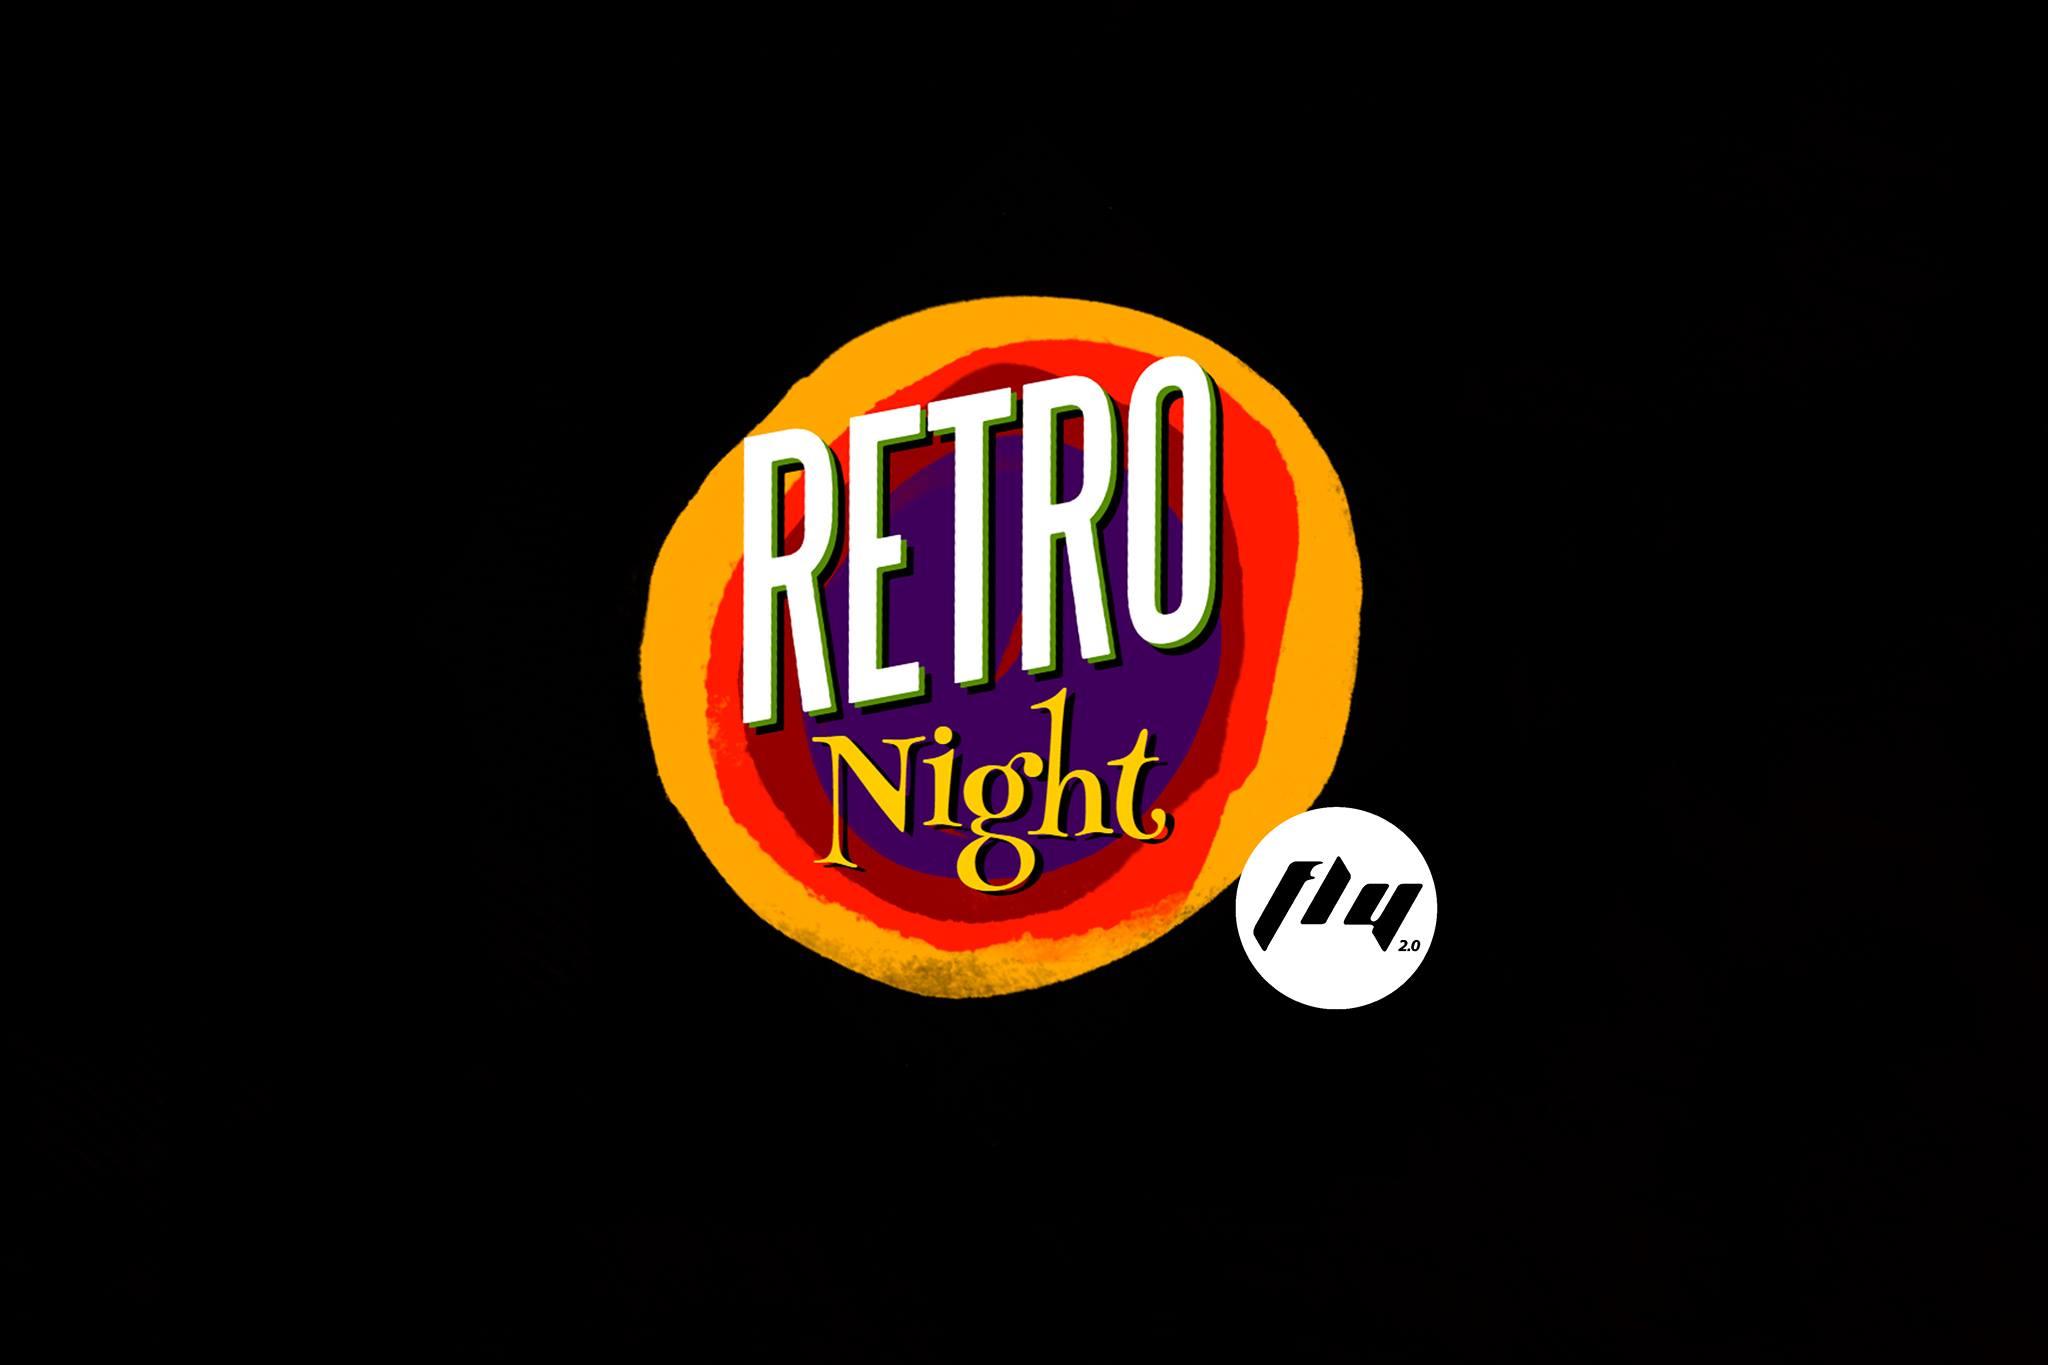 Retro-Night!